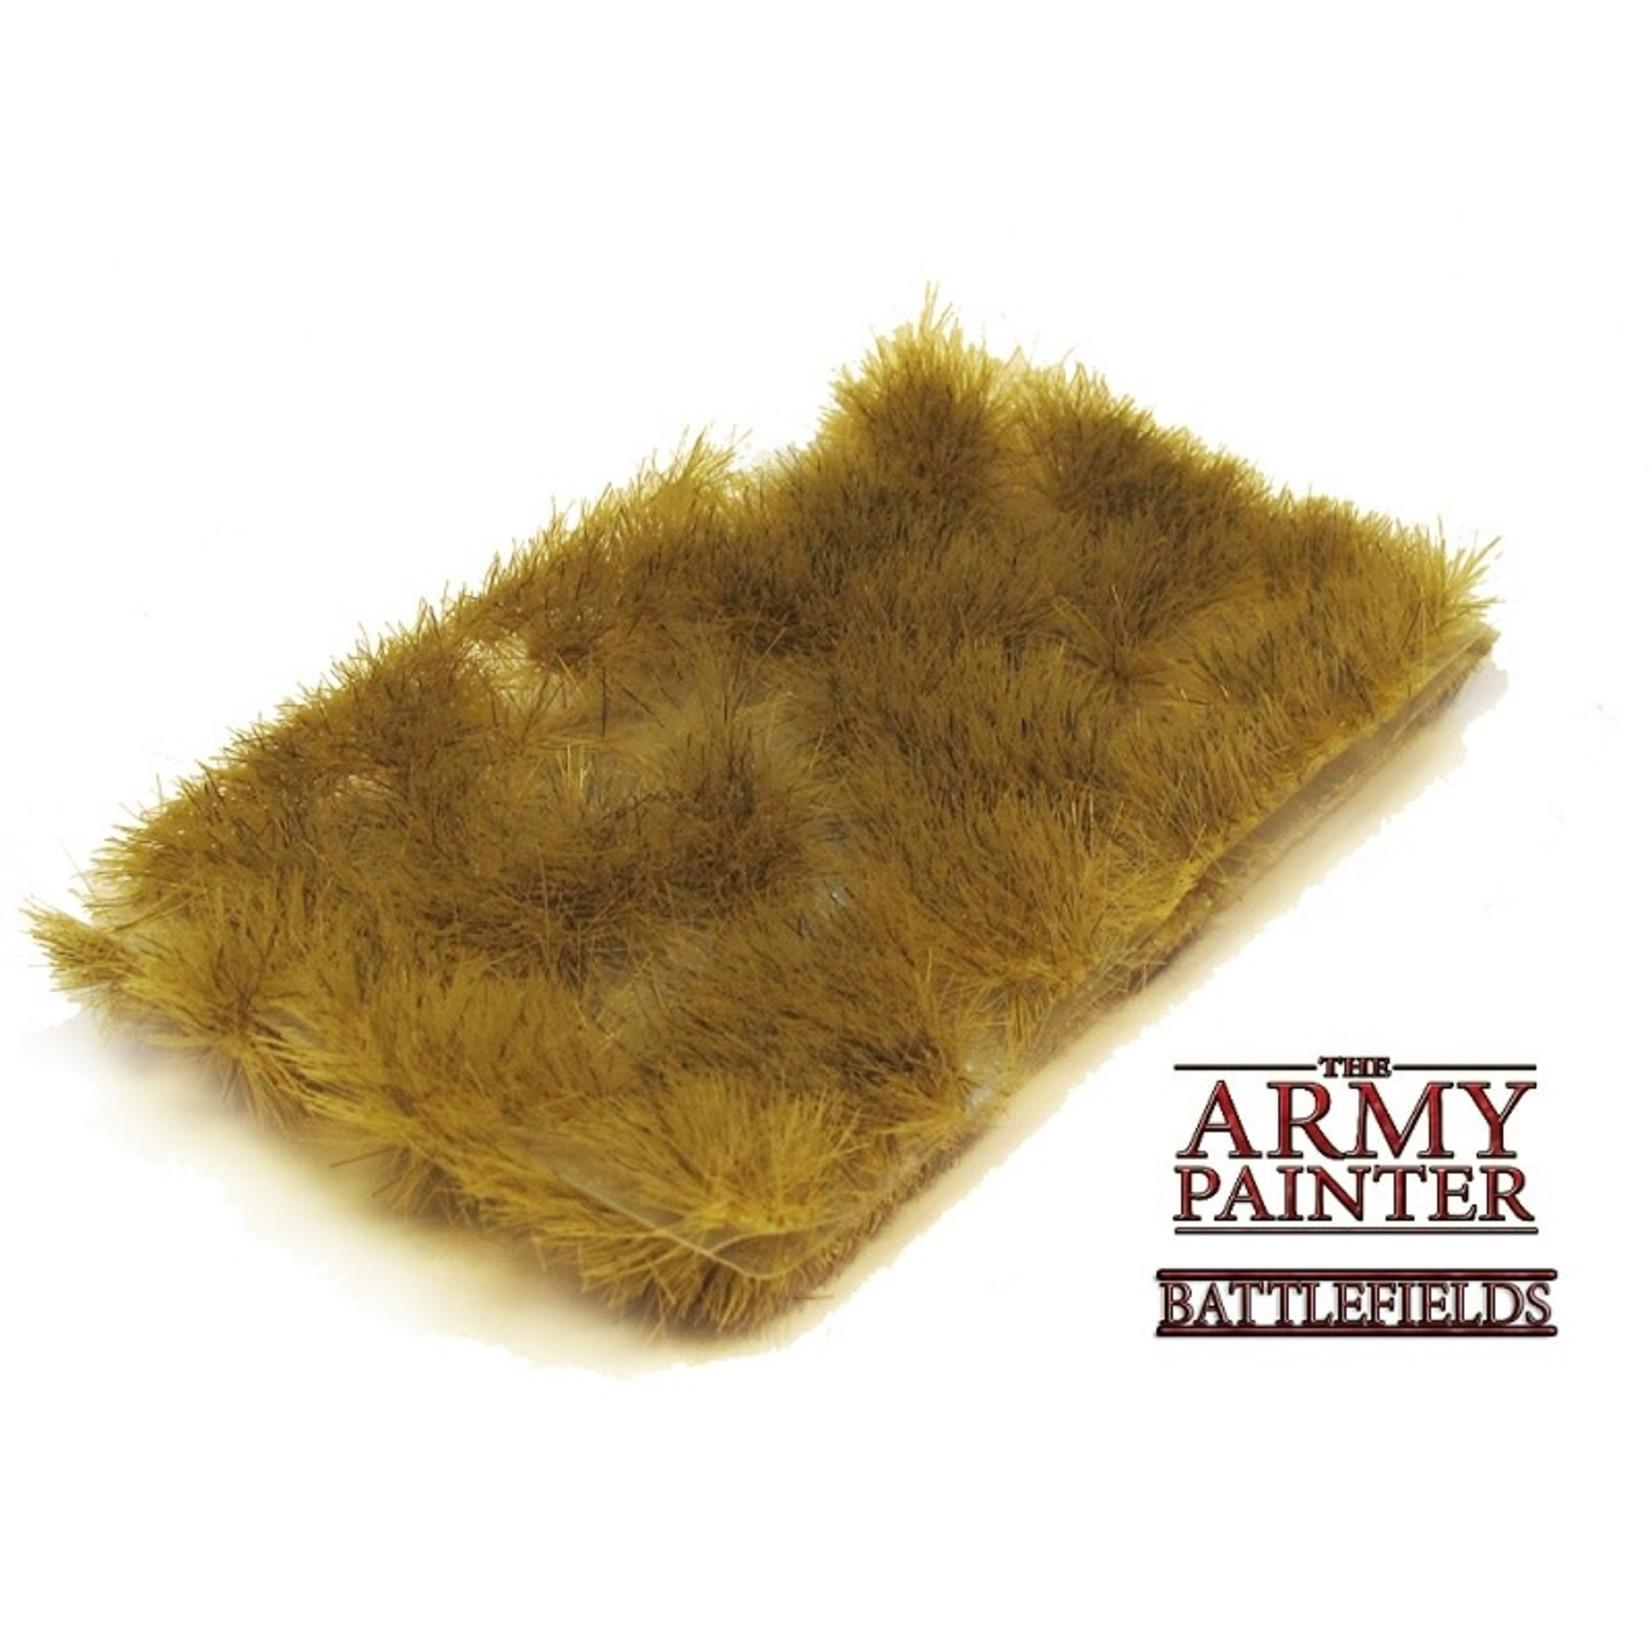 Army Painter Battlefields XP Winter Tuft